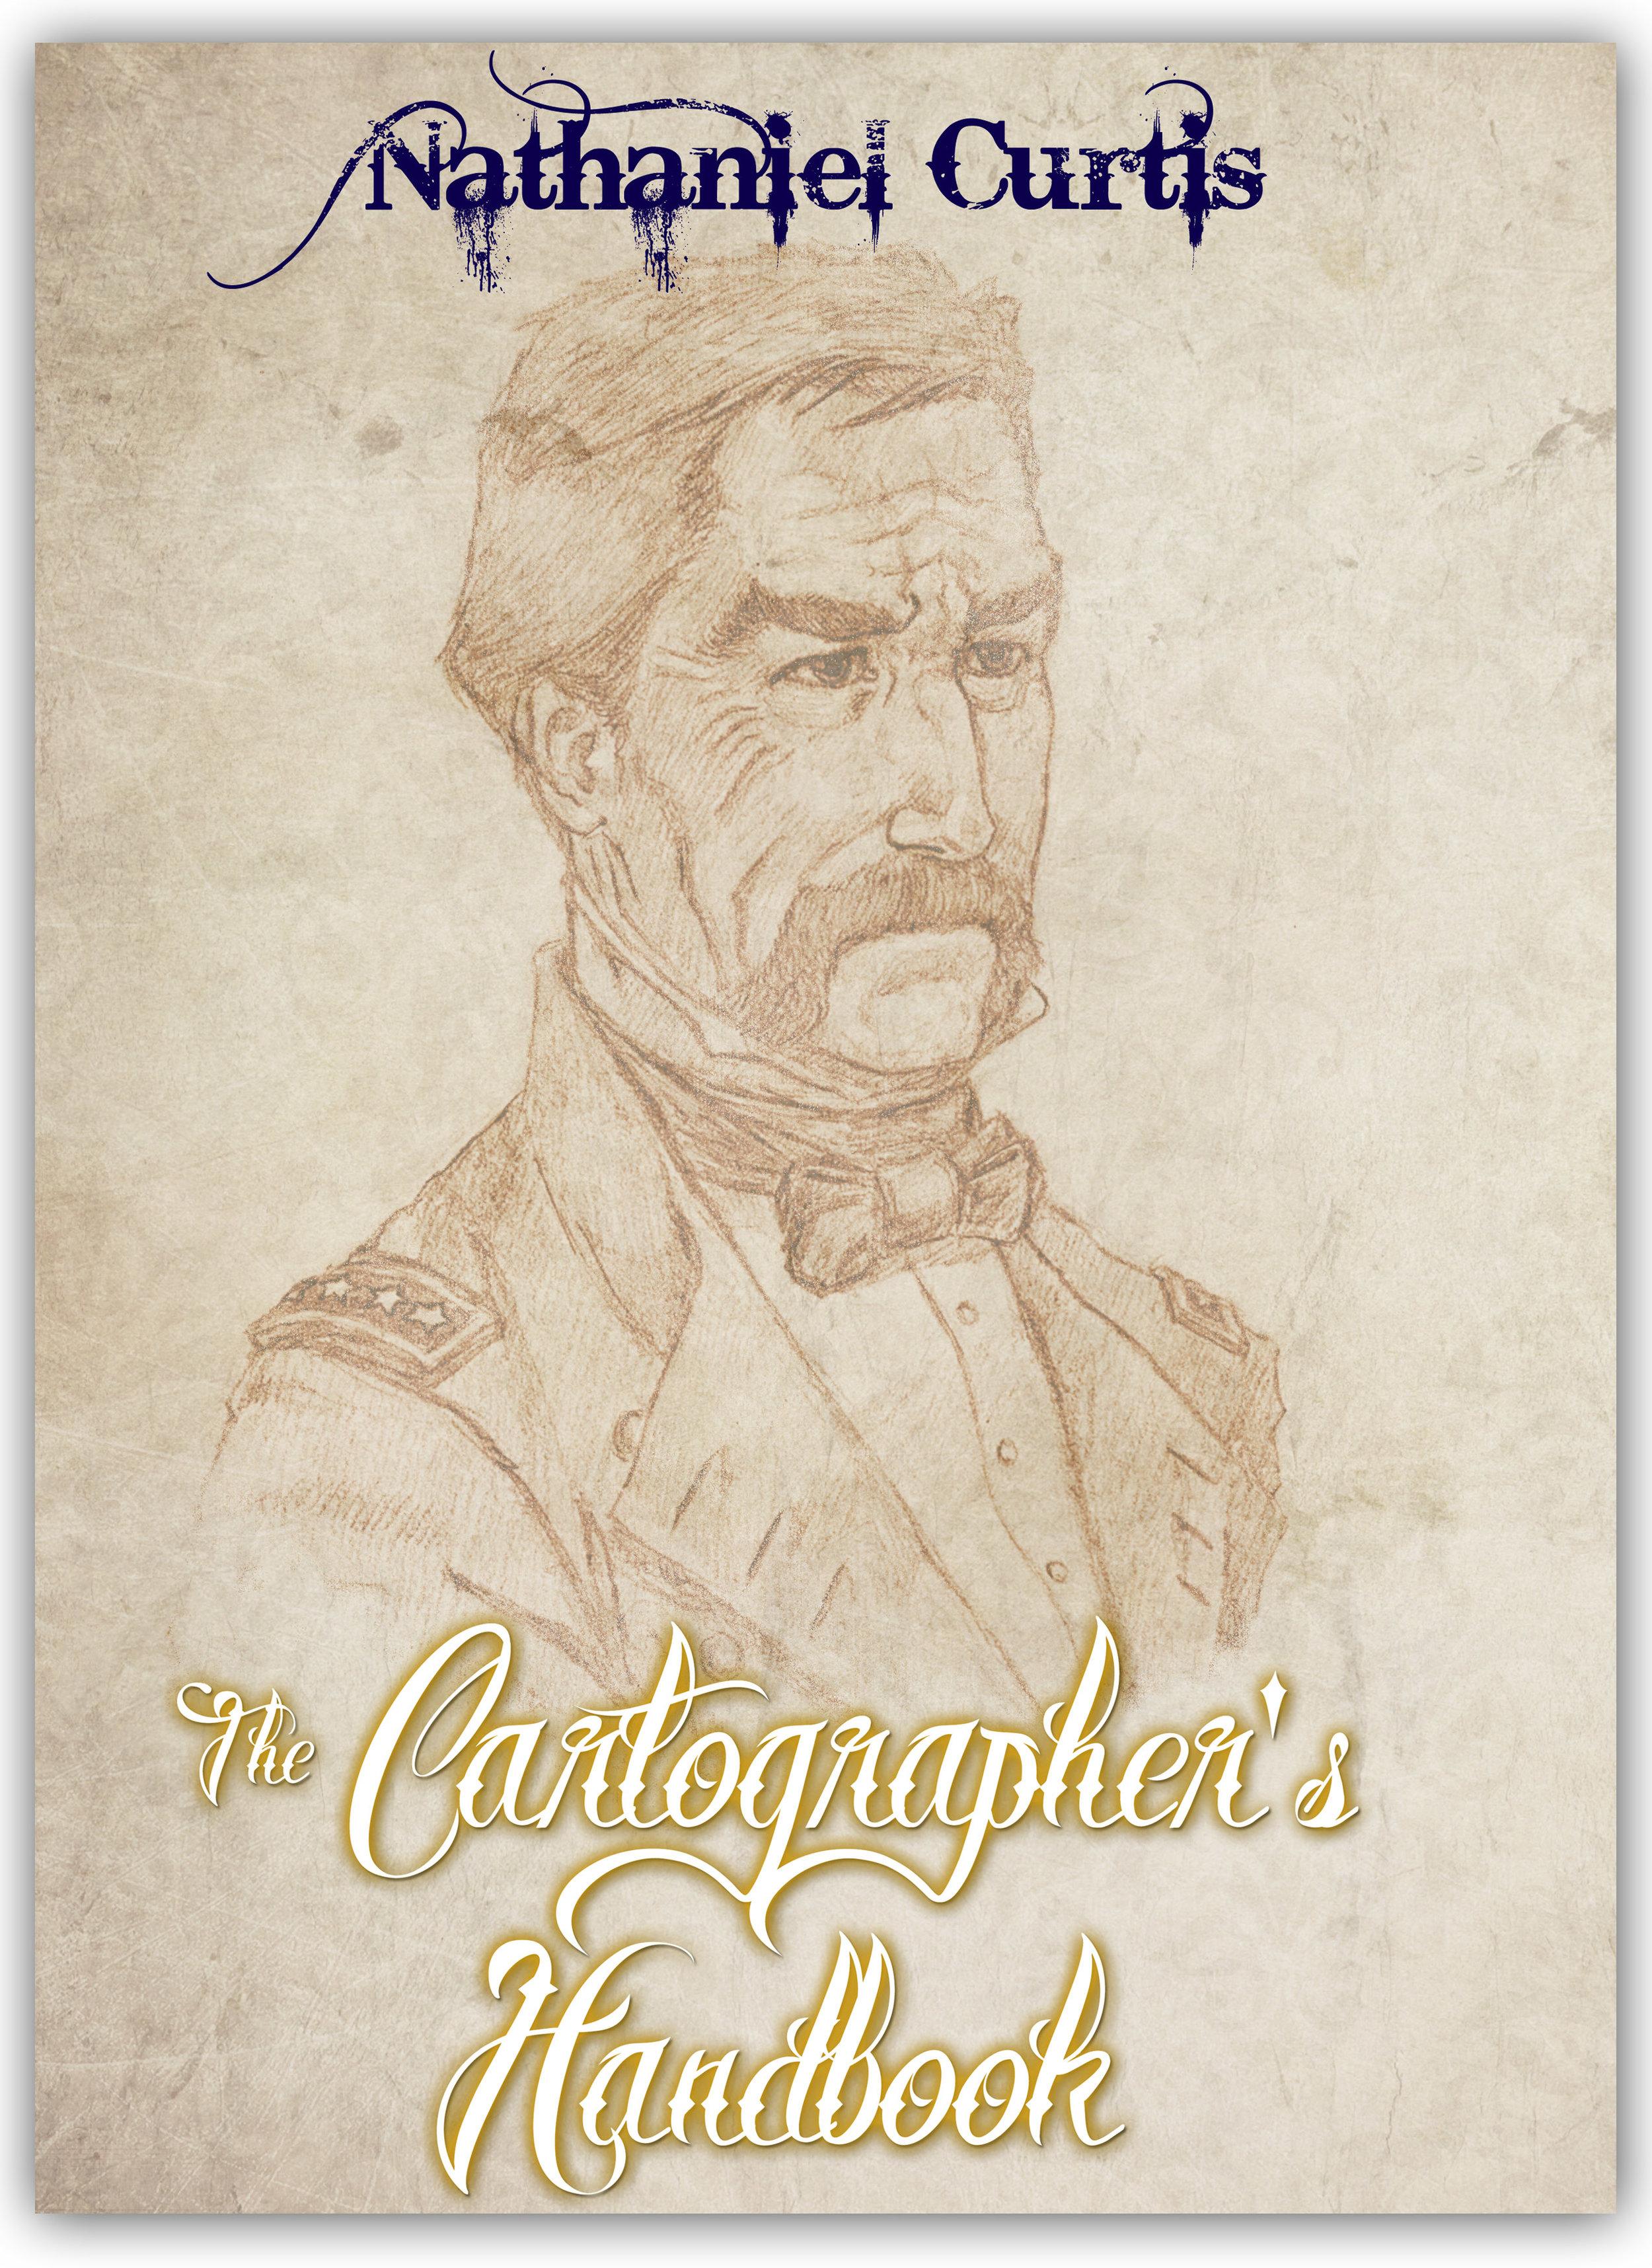 01. Nathaniel Curtis TCH.jpg